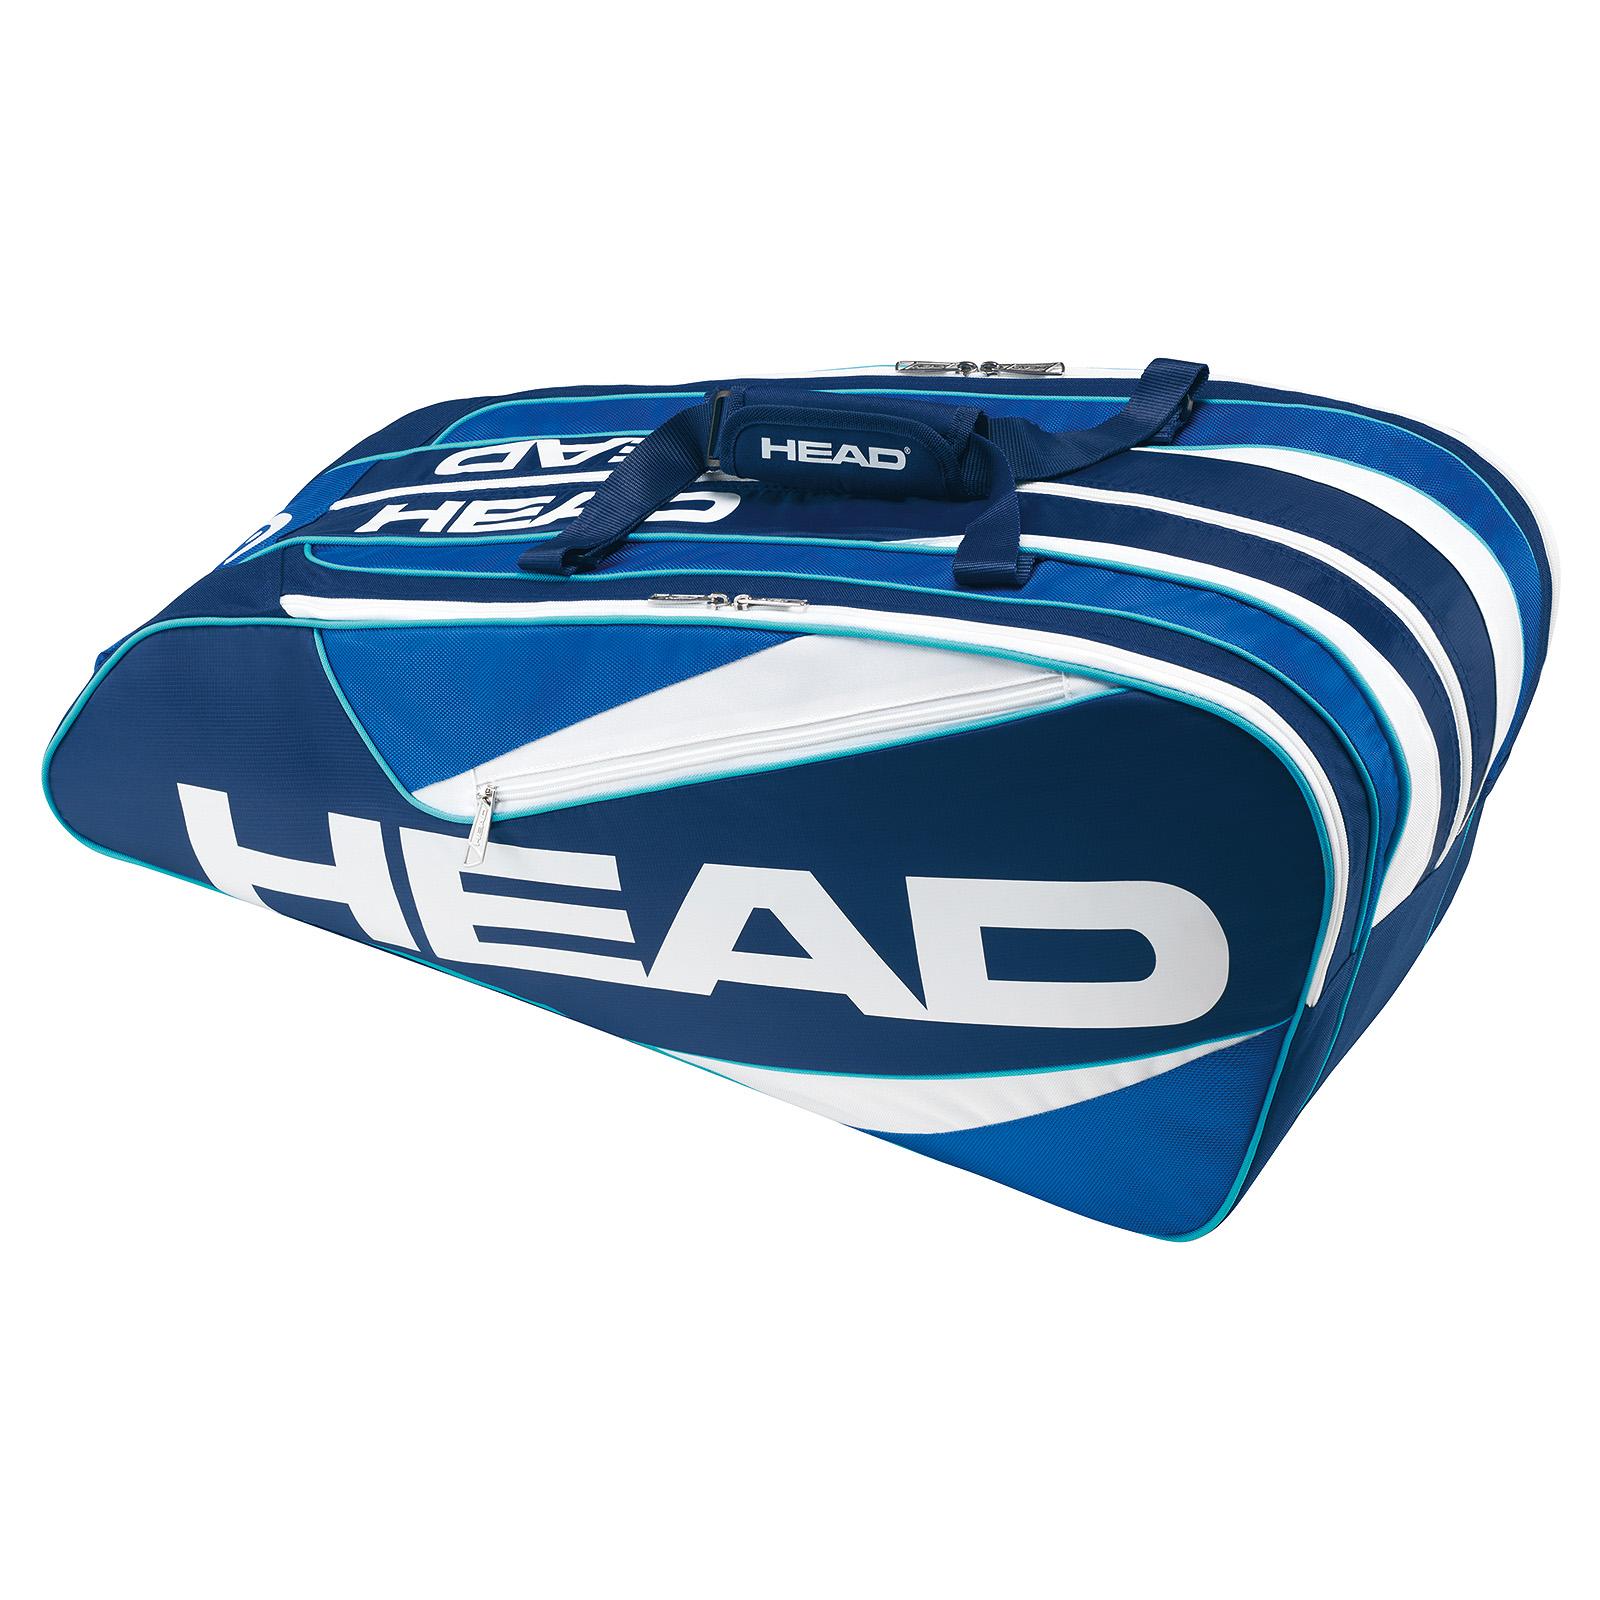 HEAD Elite Supercombi 9R Blue